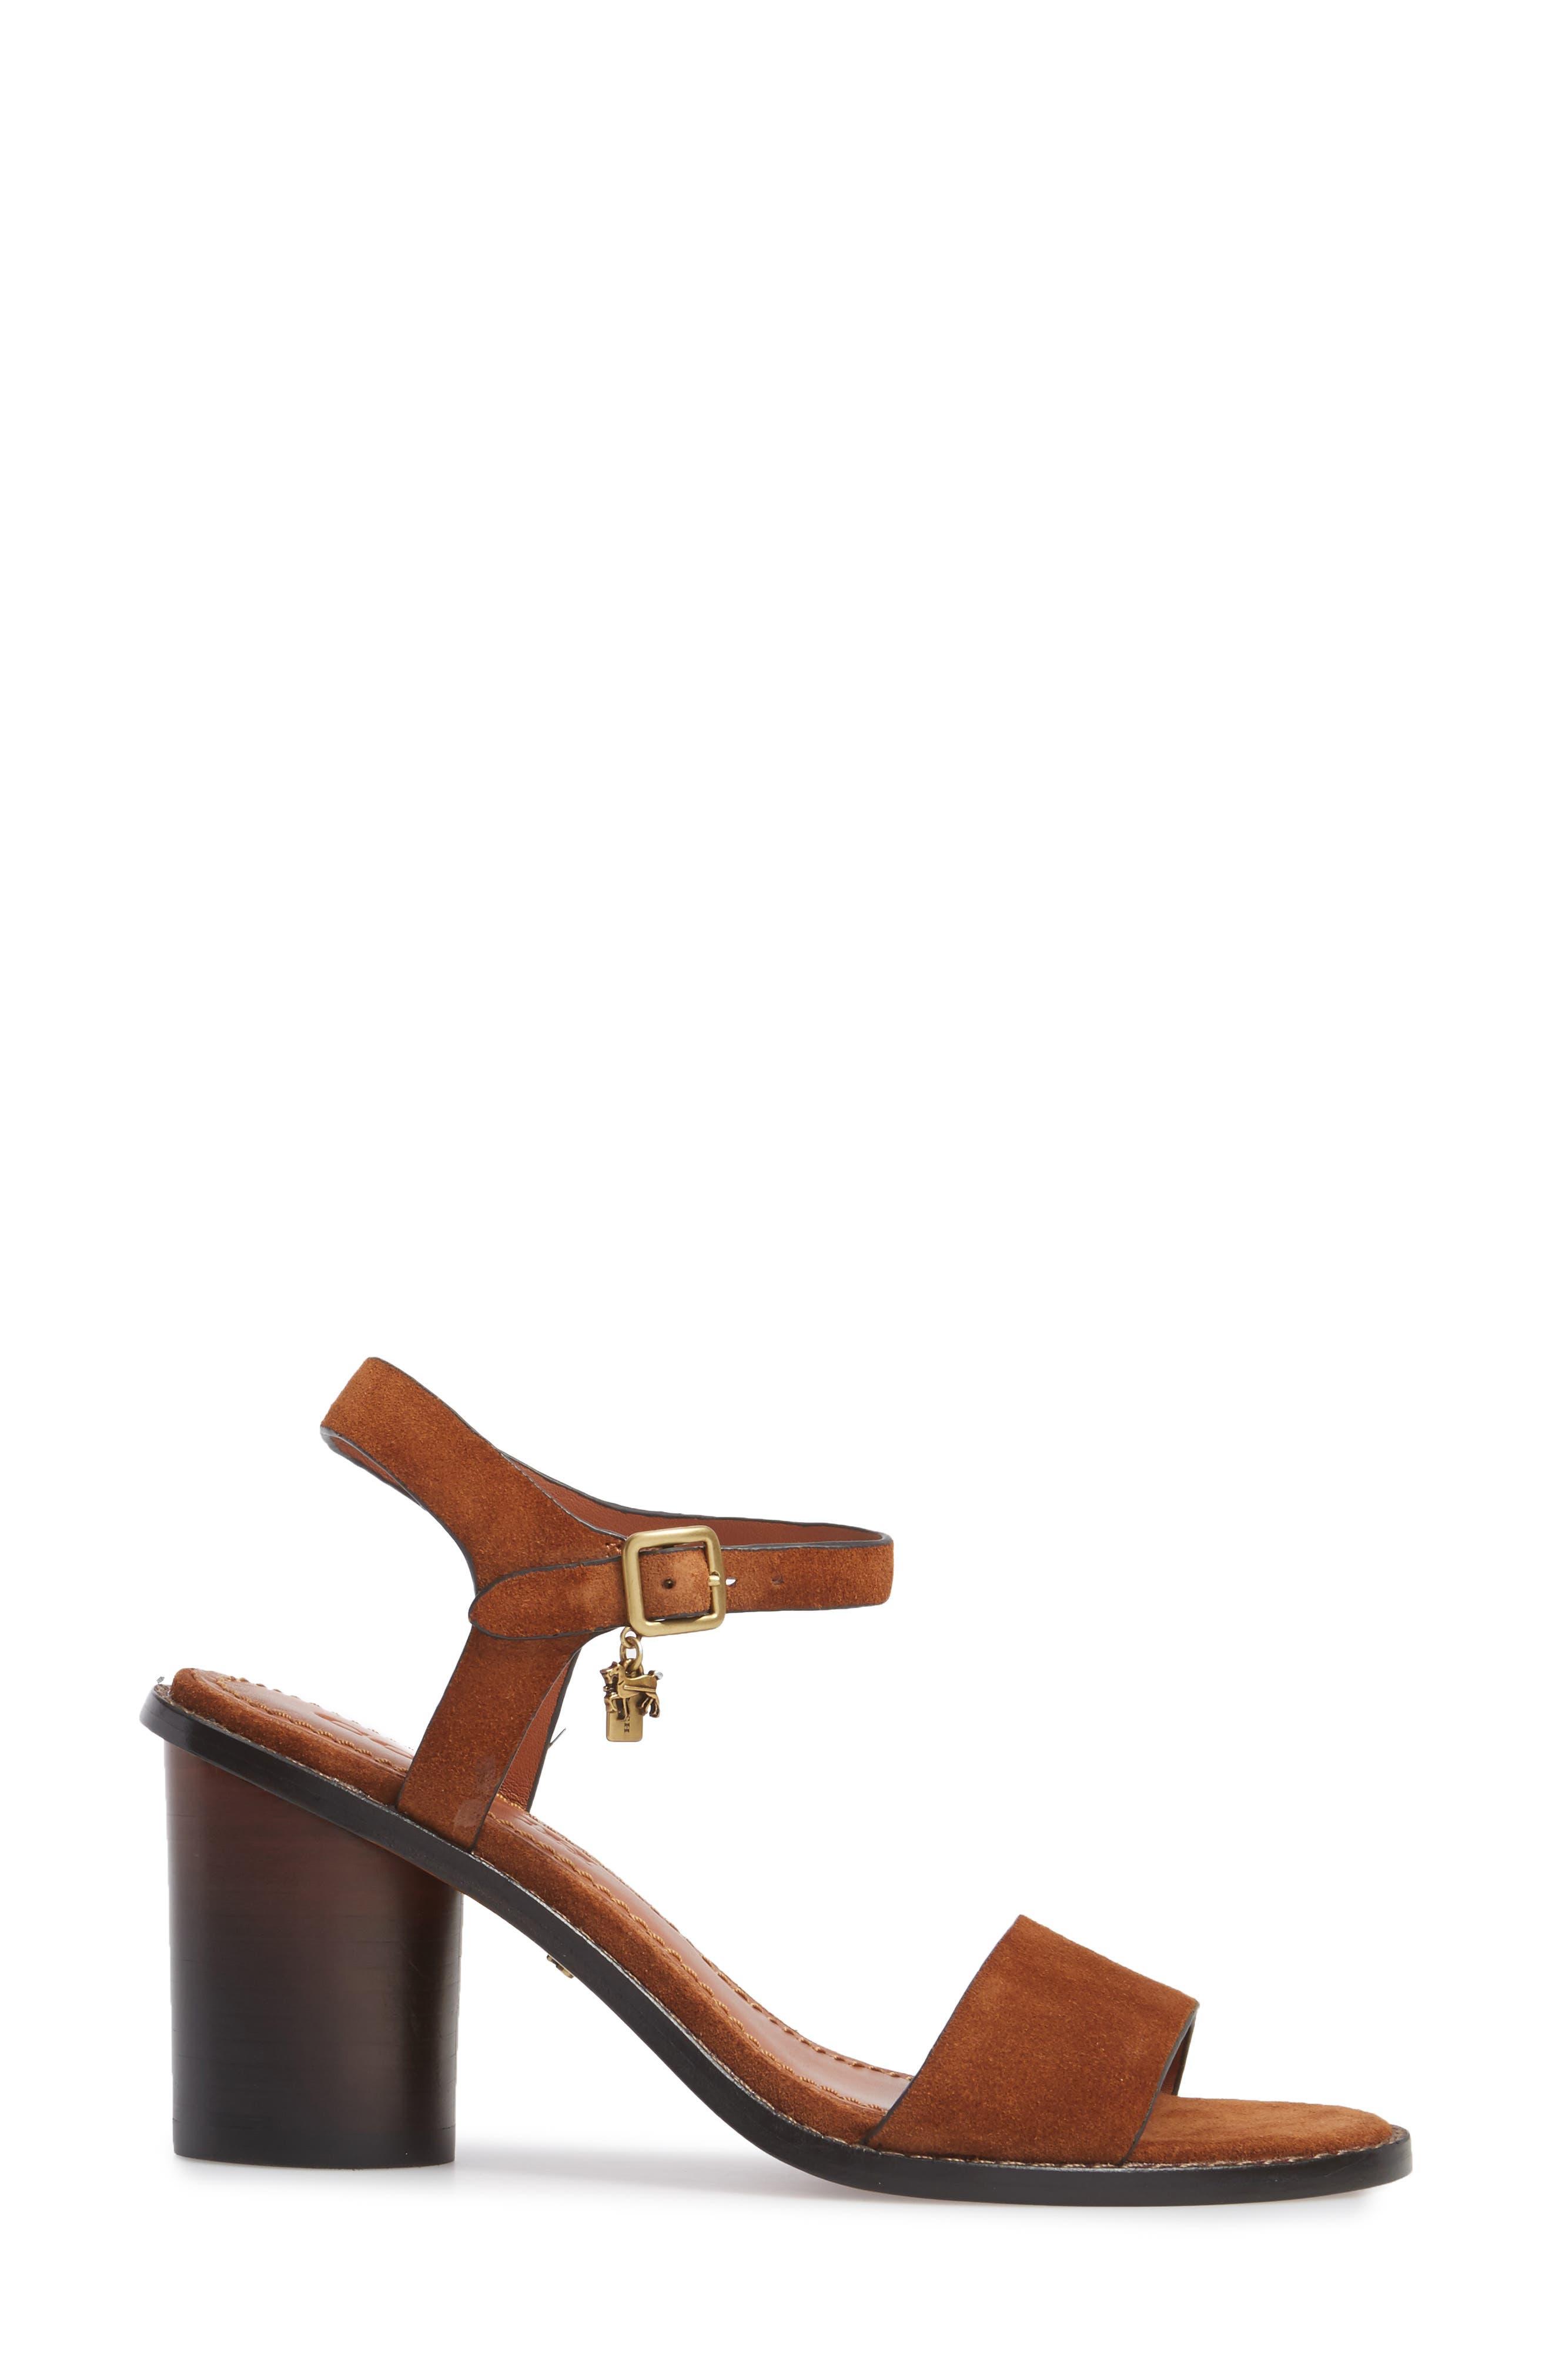 Column Heel Sandal,                             Alternate thumbnail 3, color,                             Saddle Suede